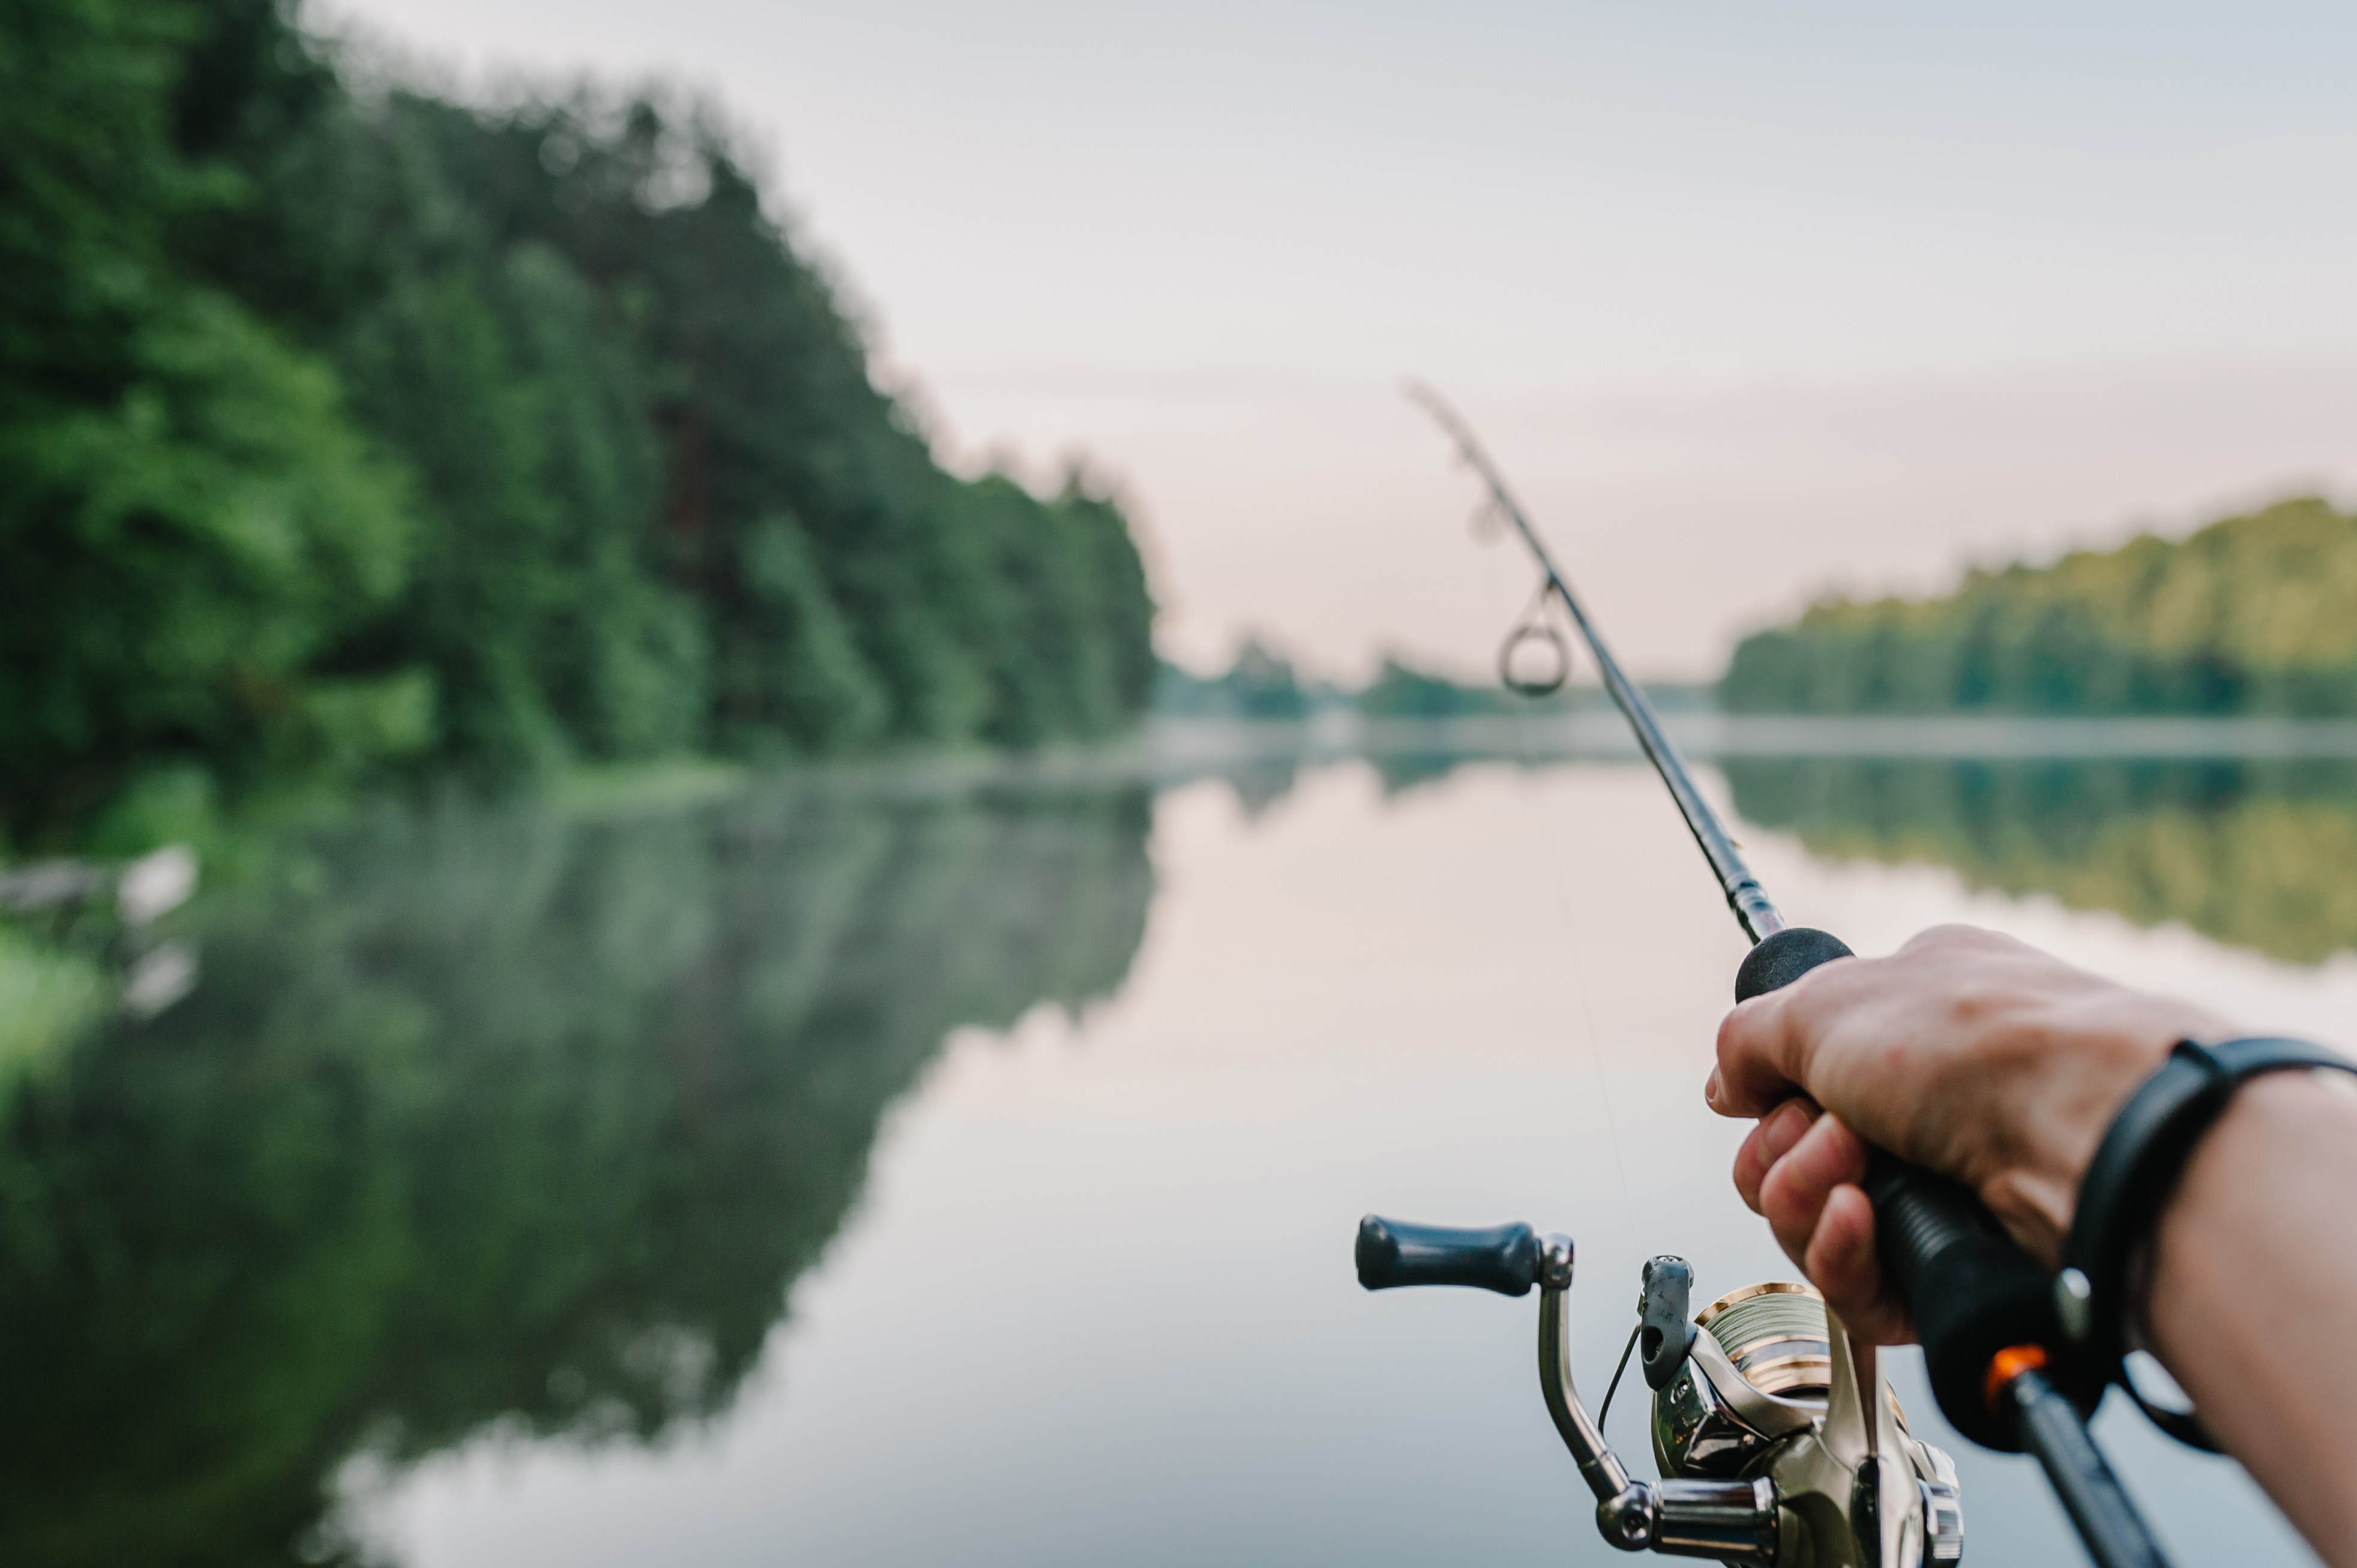 Final plans released for hunting, fishing on RI National Wildlife Refuges | WPRI.com